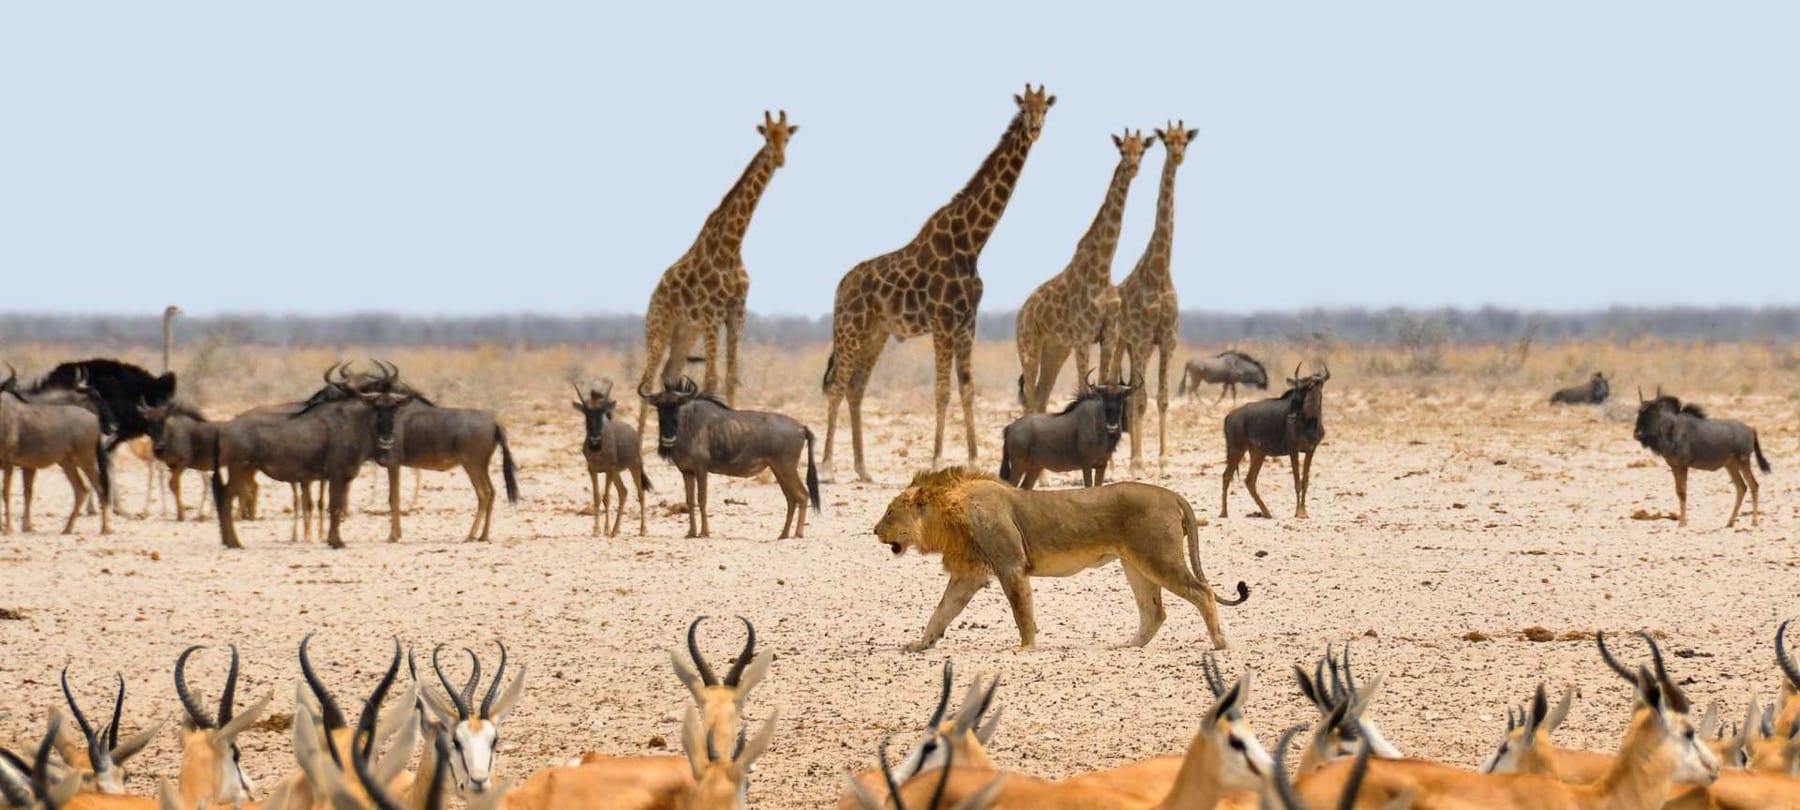 Resultado de imagen para Parque Nacional de Etosha,